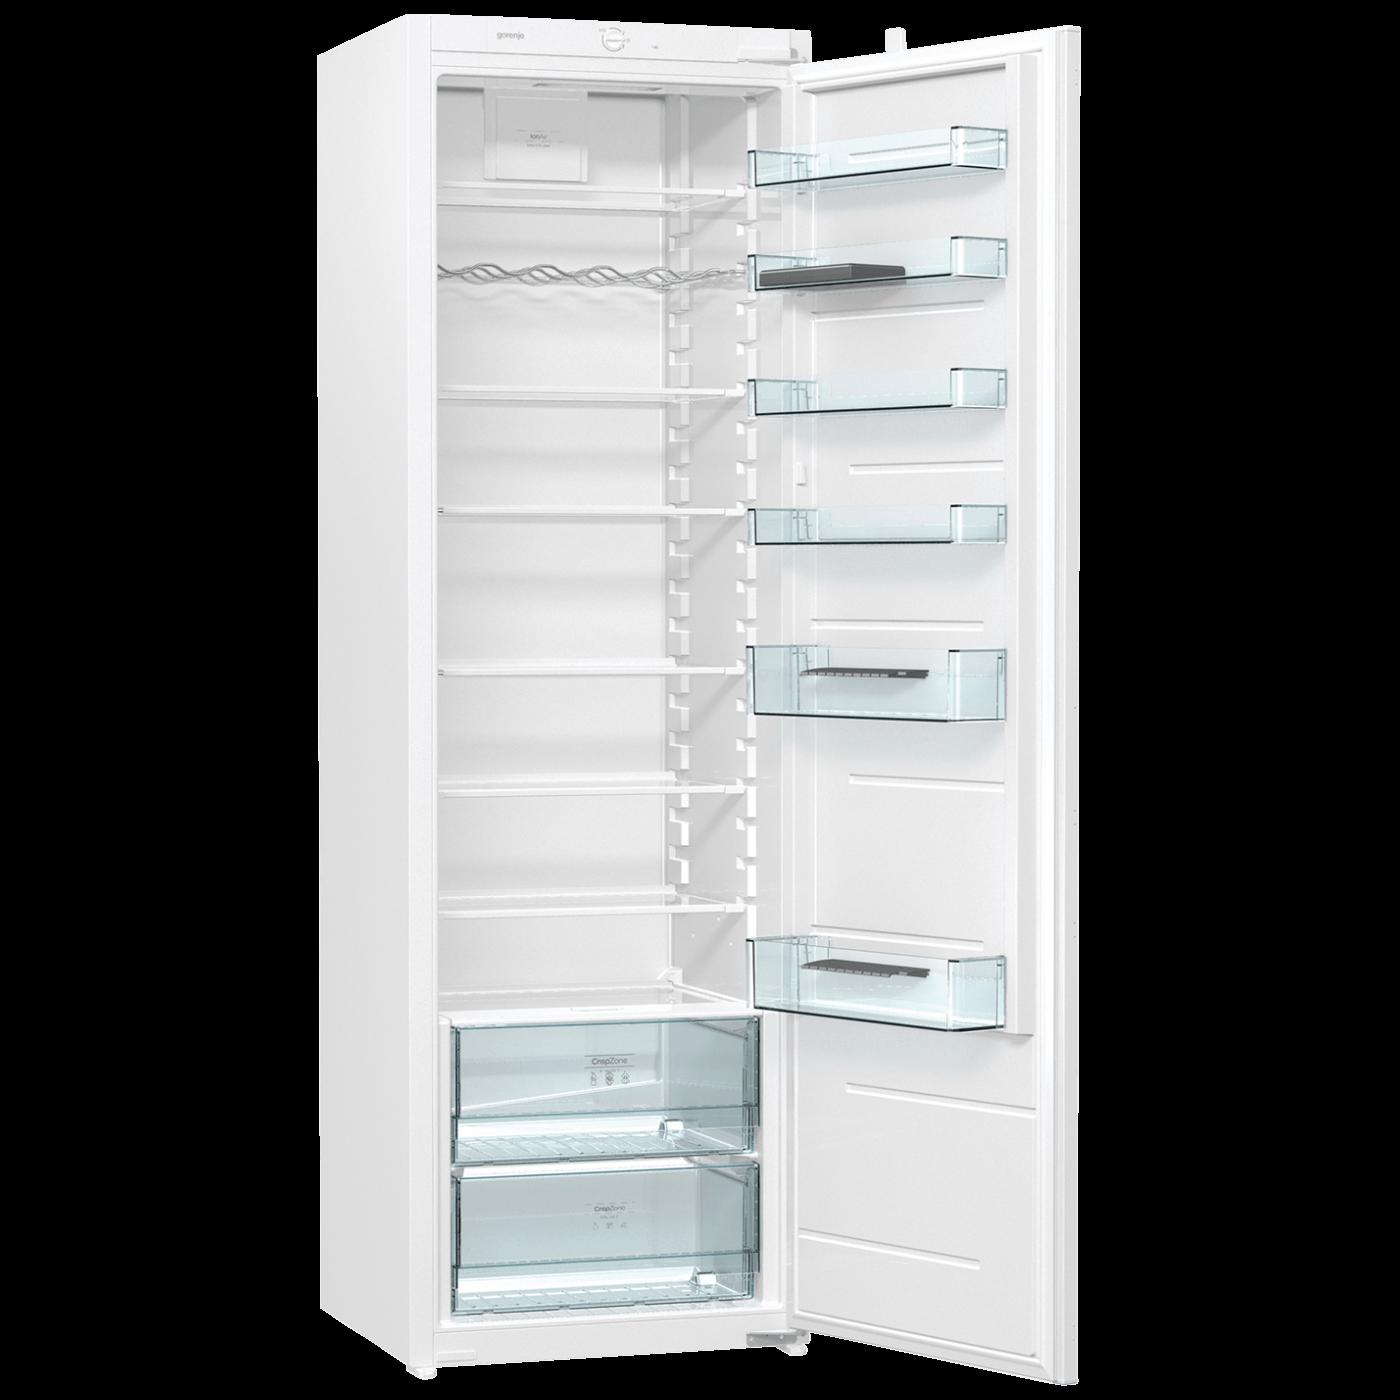 Ugradbeni frižider, bruto zapremina 305 l, A++